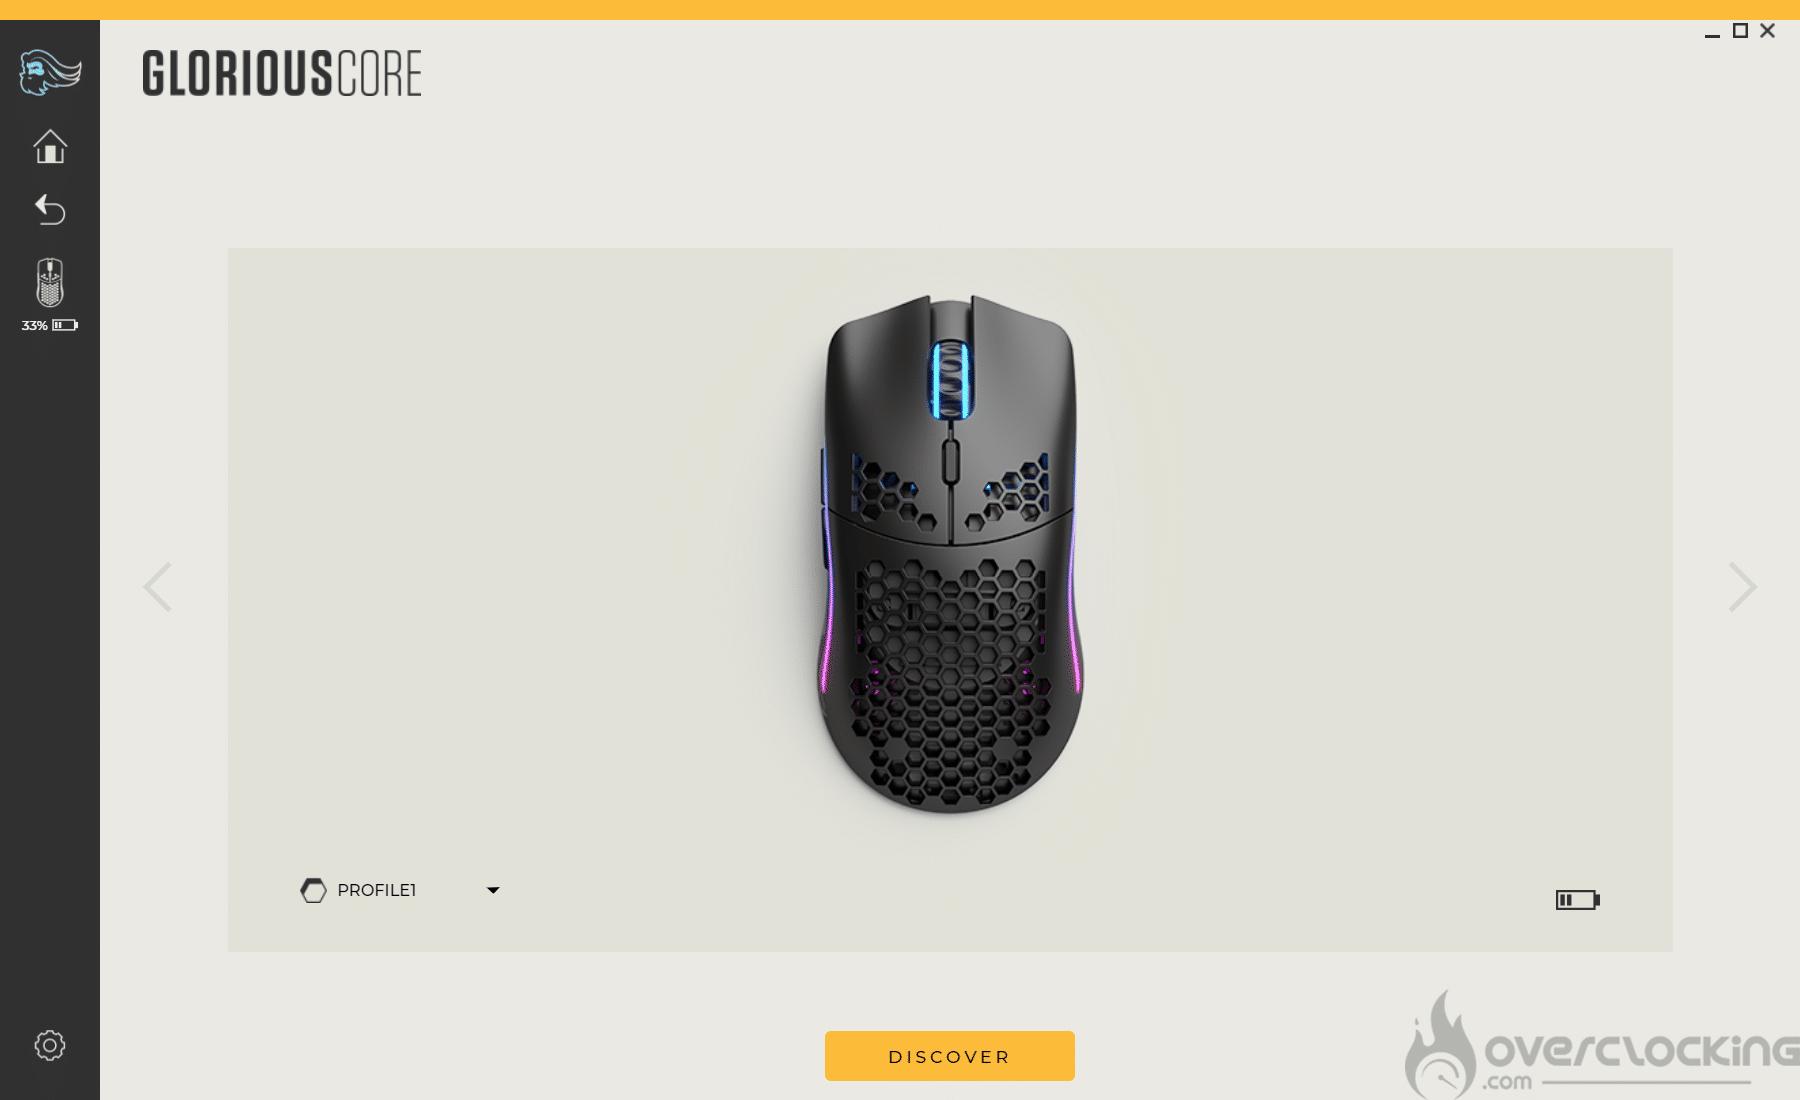 Glorious PC Gaming Race Model O Wireless Glorious Core